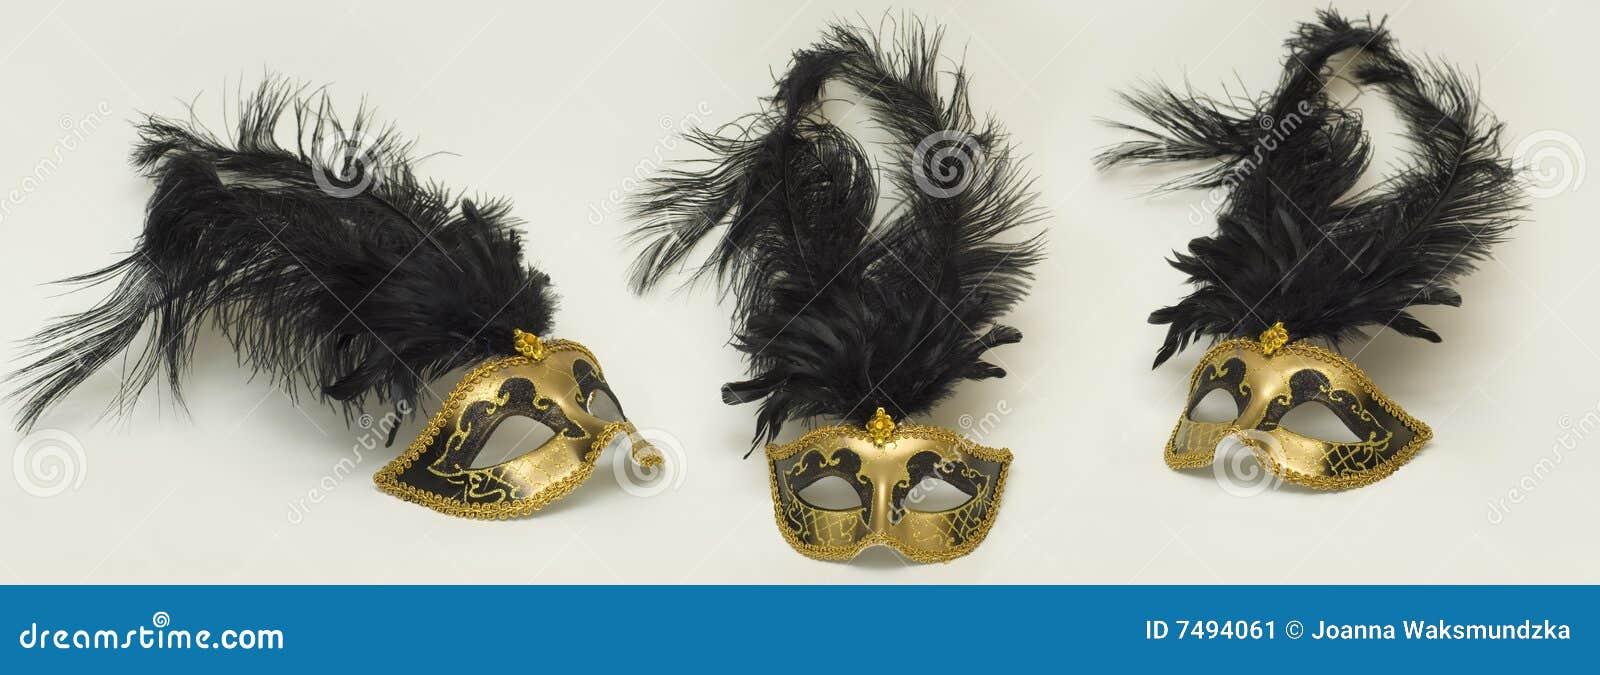 Złociste maski